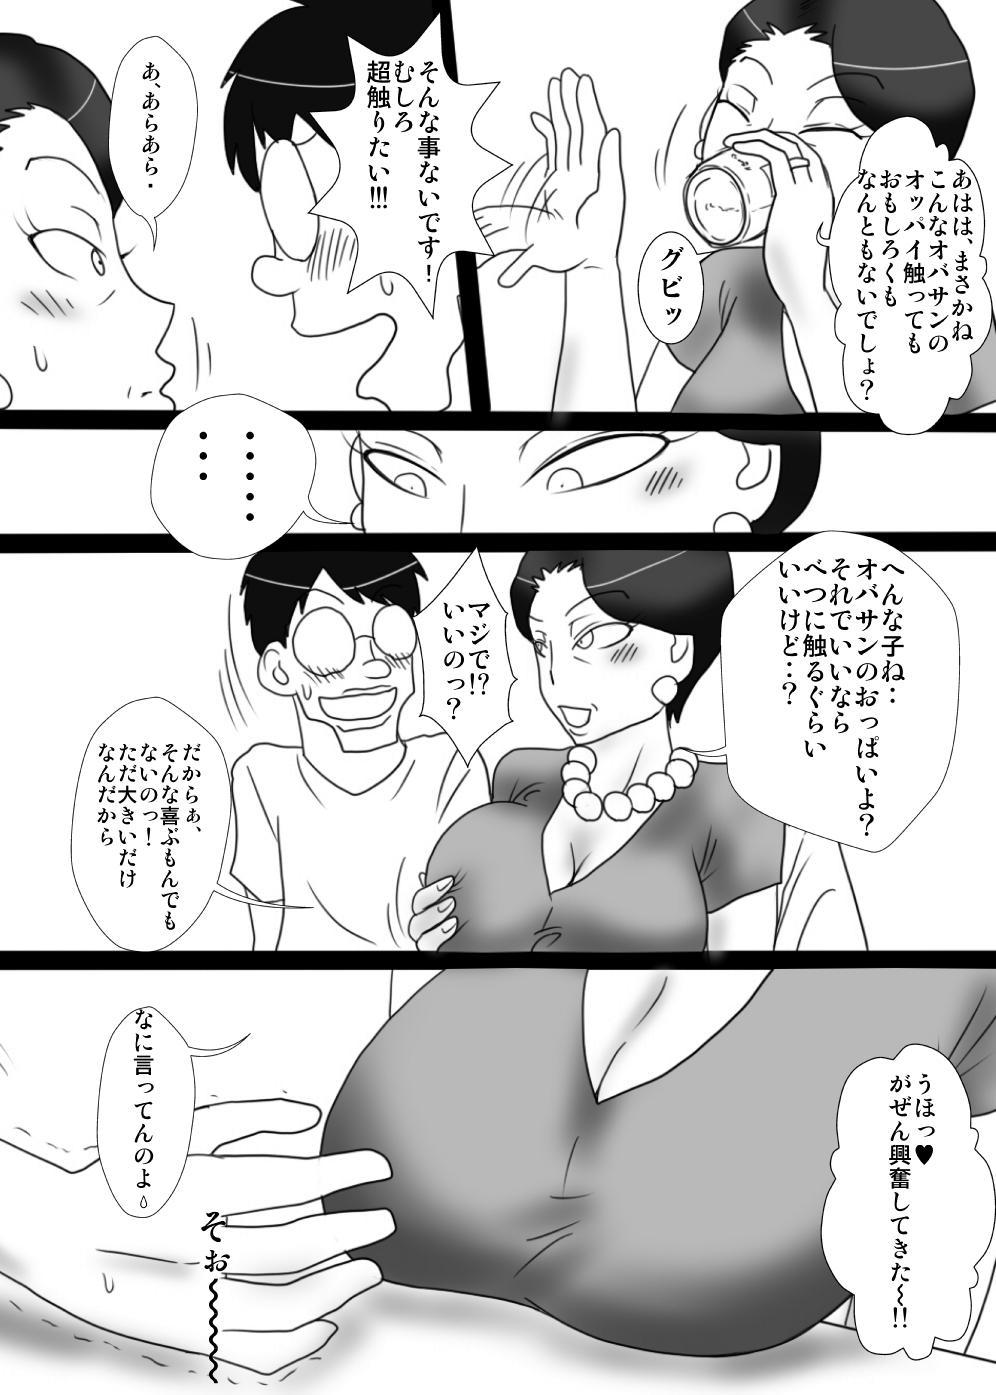 Oba-san o Otosuze! 6